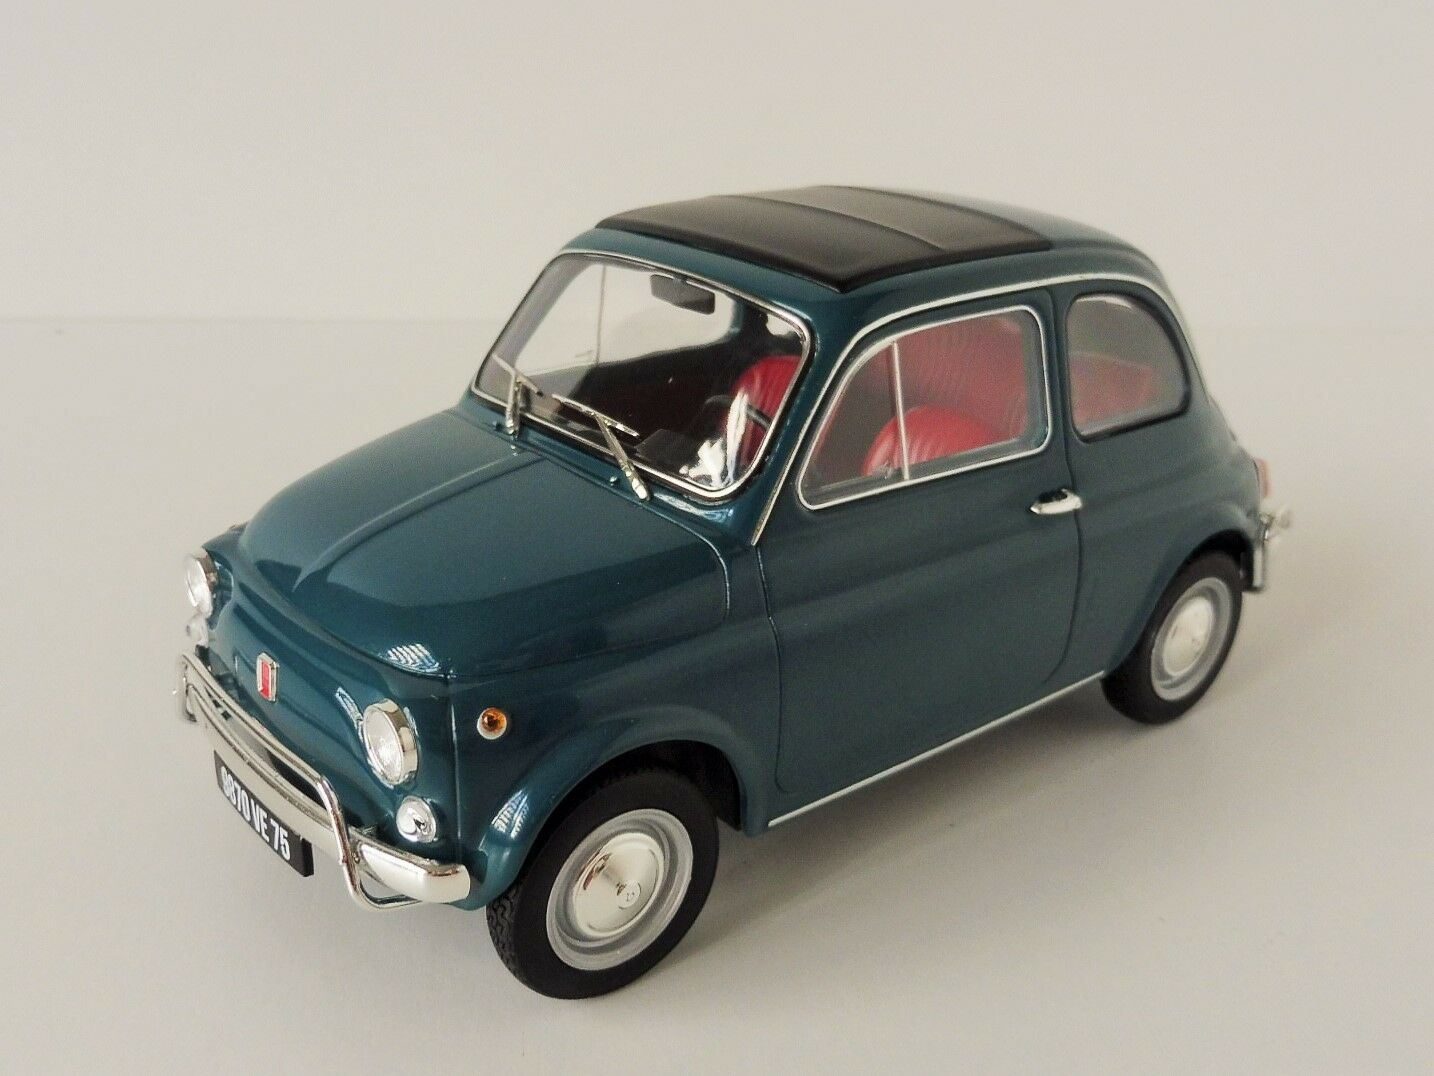 Fiat 500 L 1968 1 18 NOREV 187770 500 Cinquecento bleu Turchese Turquoise